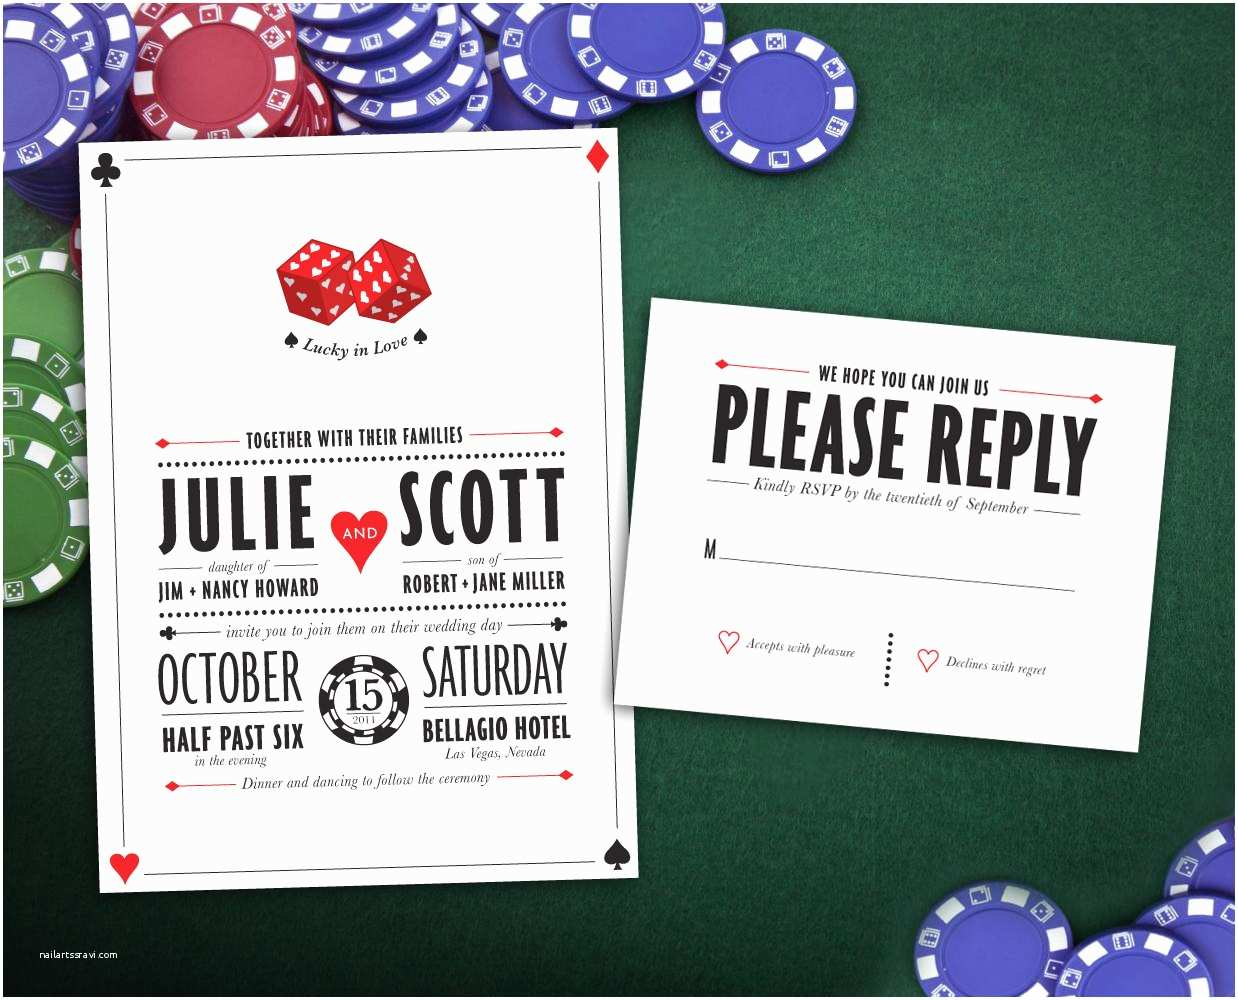 Printable Las Vegas Wedding Invitations top Las Vegas Wedding Invitations